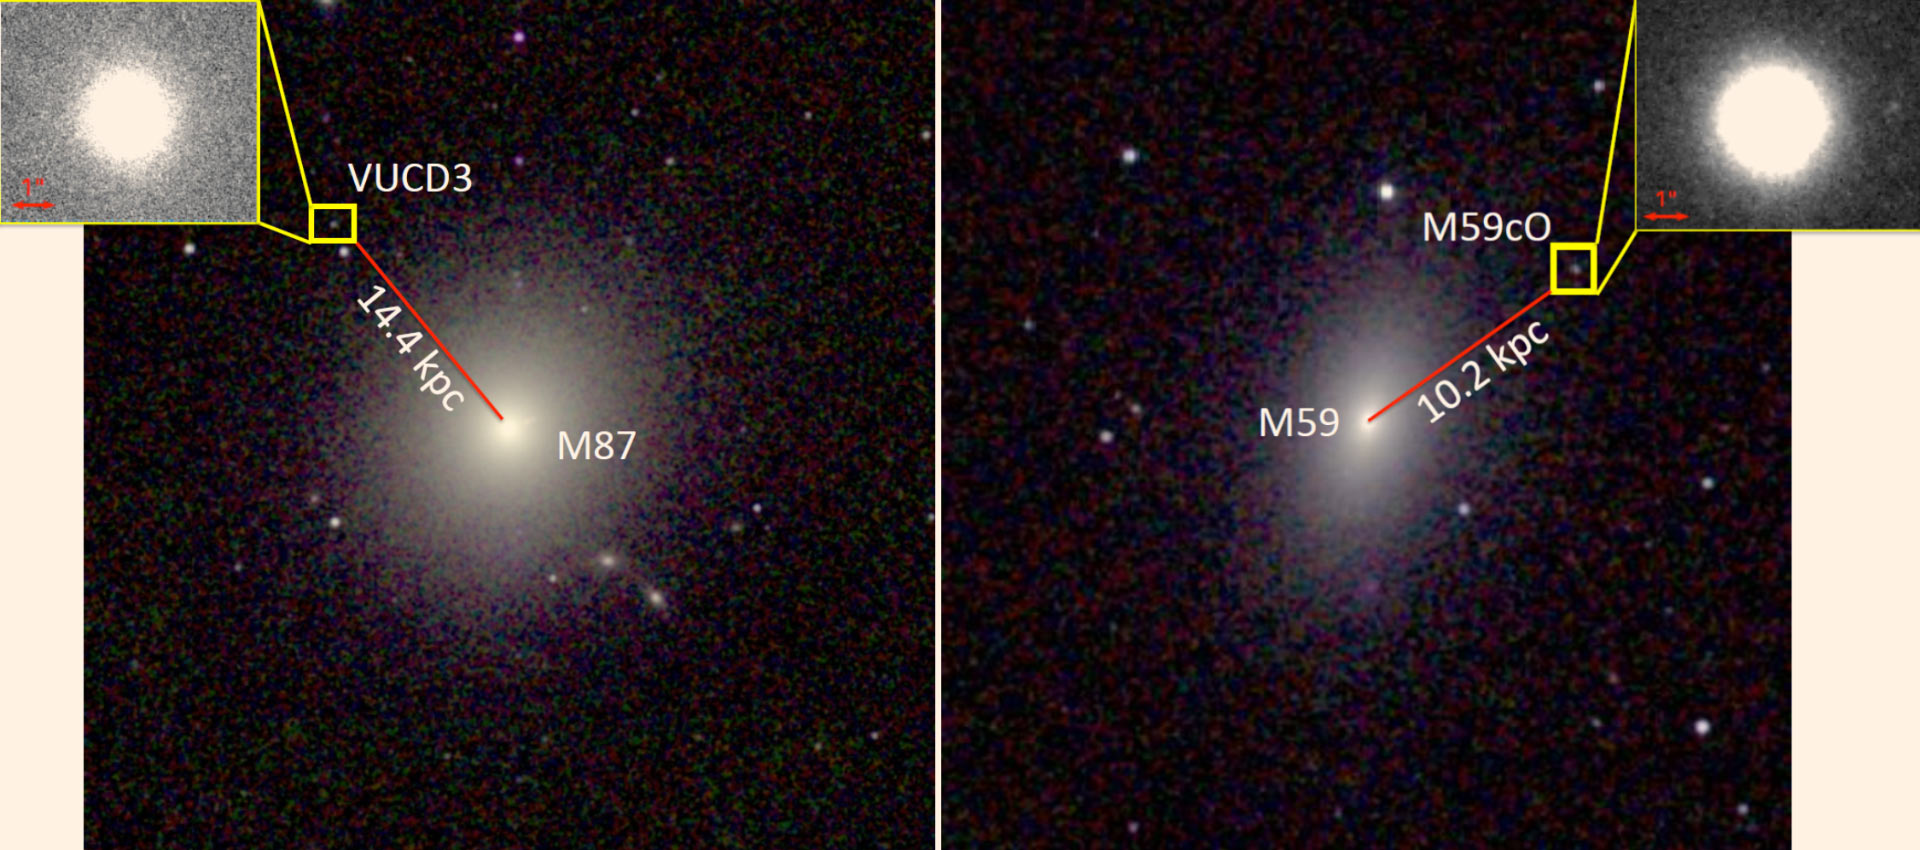 Ultrakompaktní galaxie VUCD3 a M59cO. Kredit: NASA / Space Telescope Science Institute.